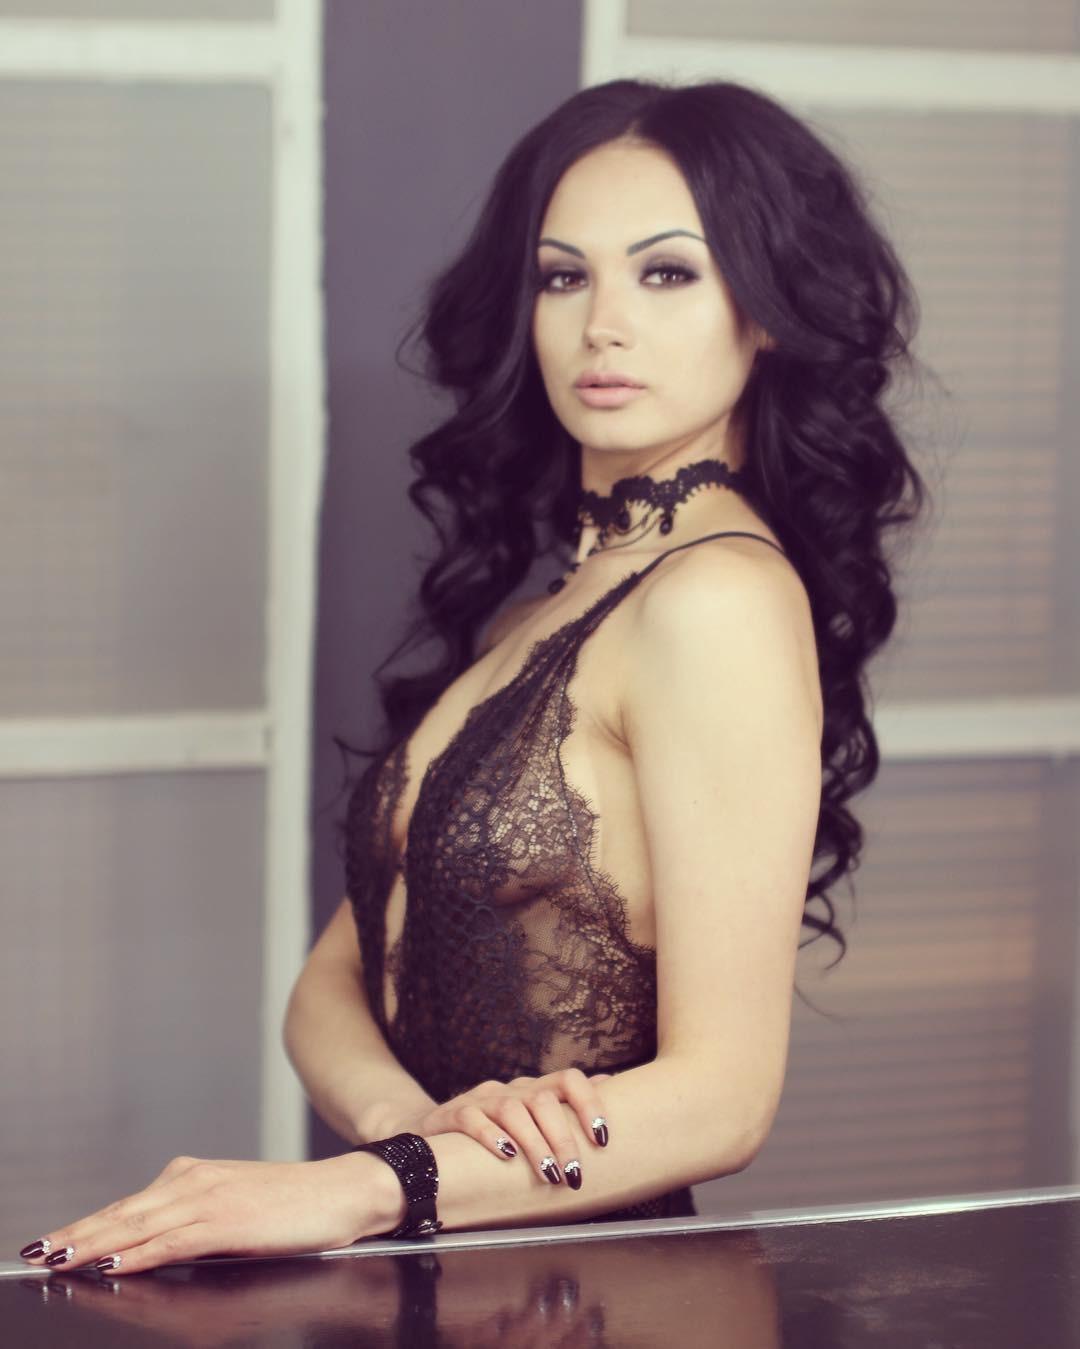 seks-s-tatarochkoy-domashnee-video-minet-onlayn-kachestvo